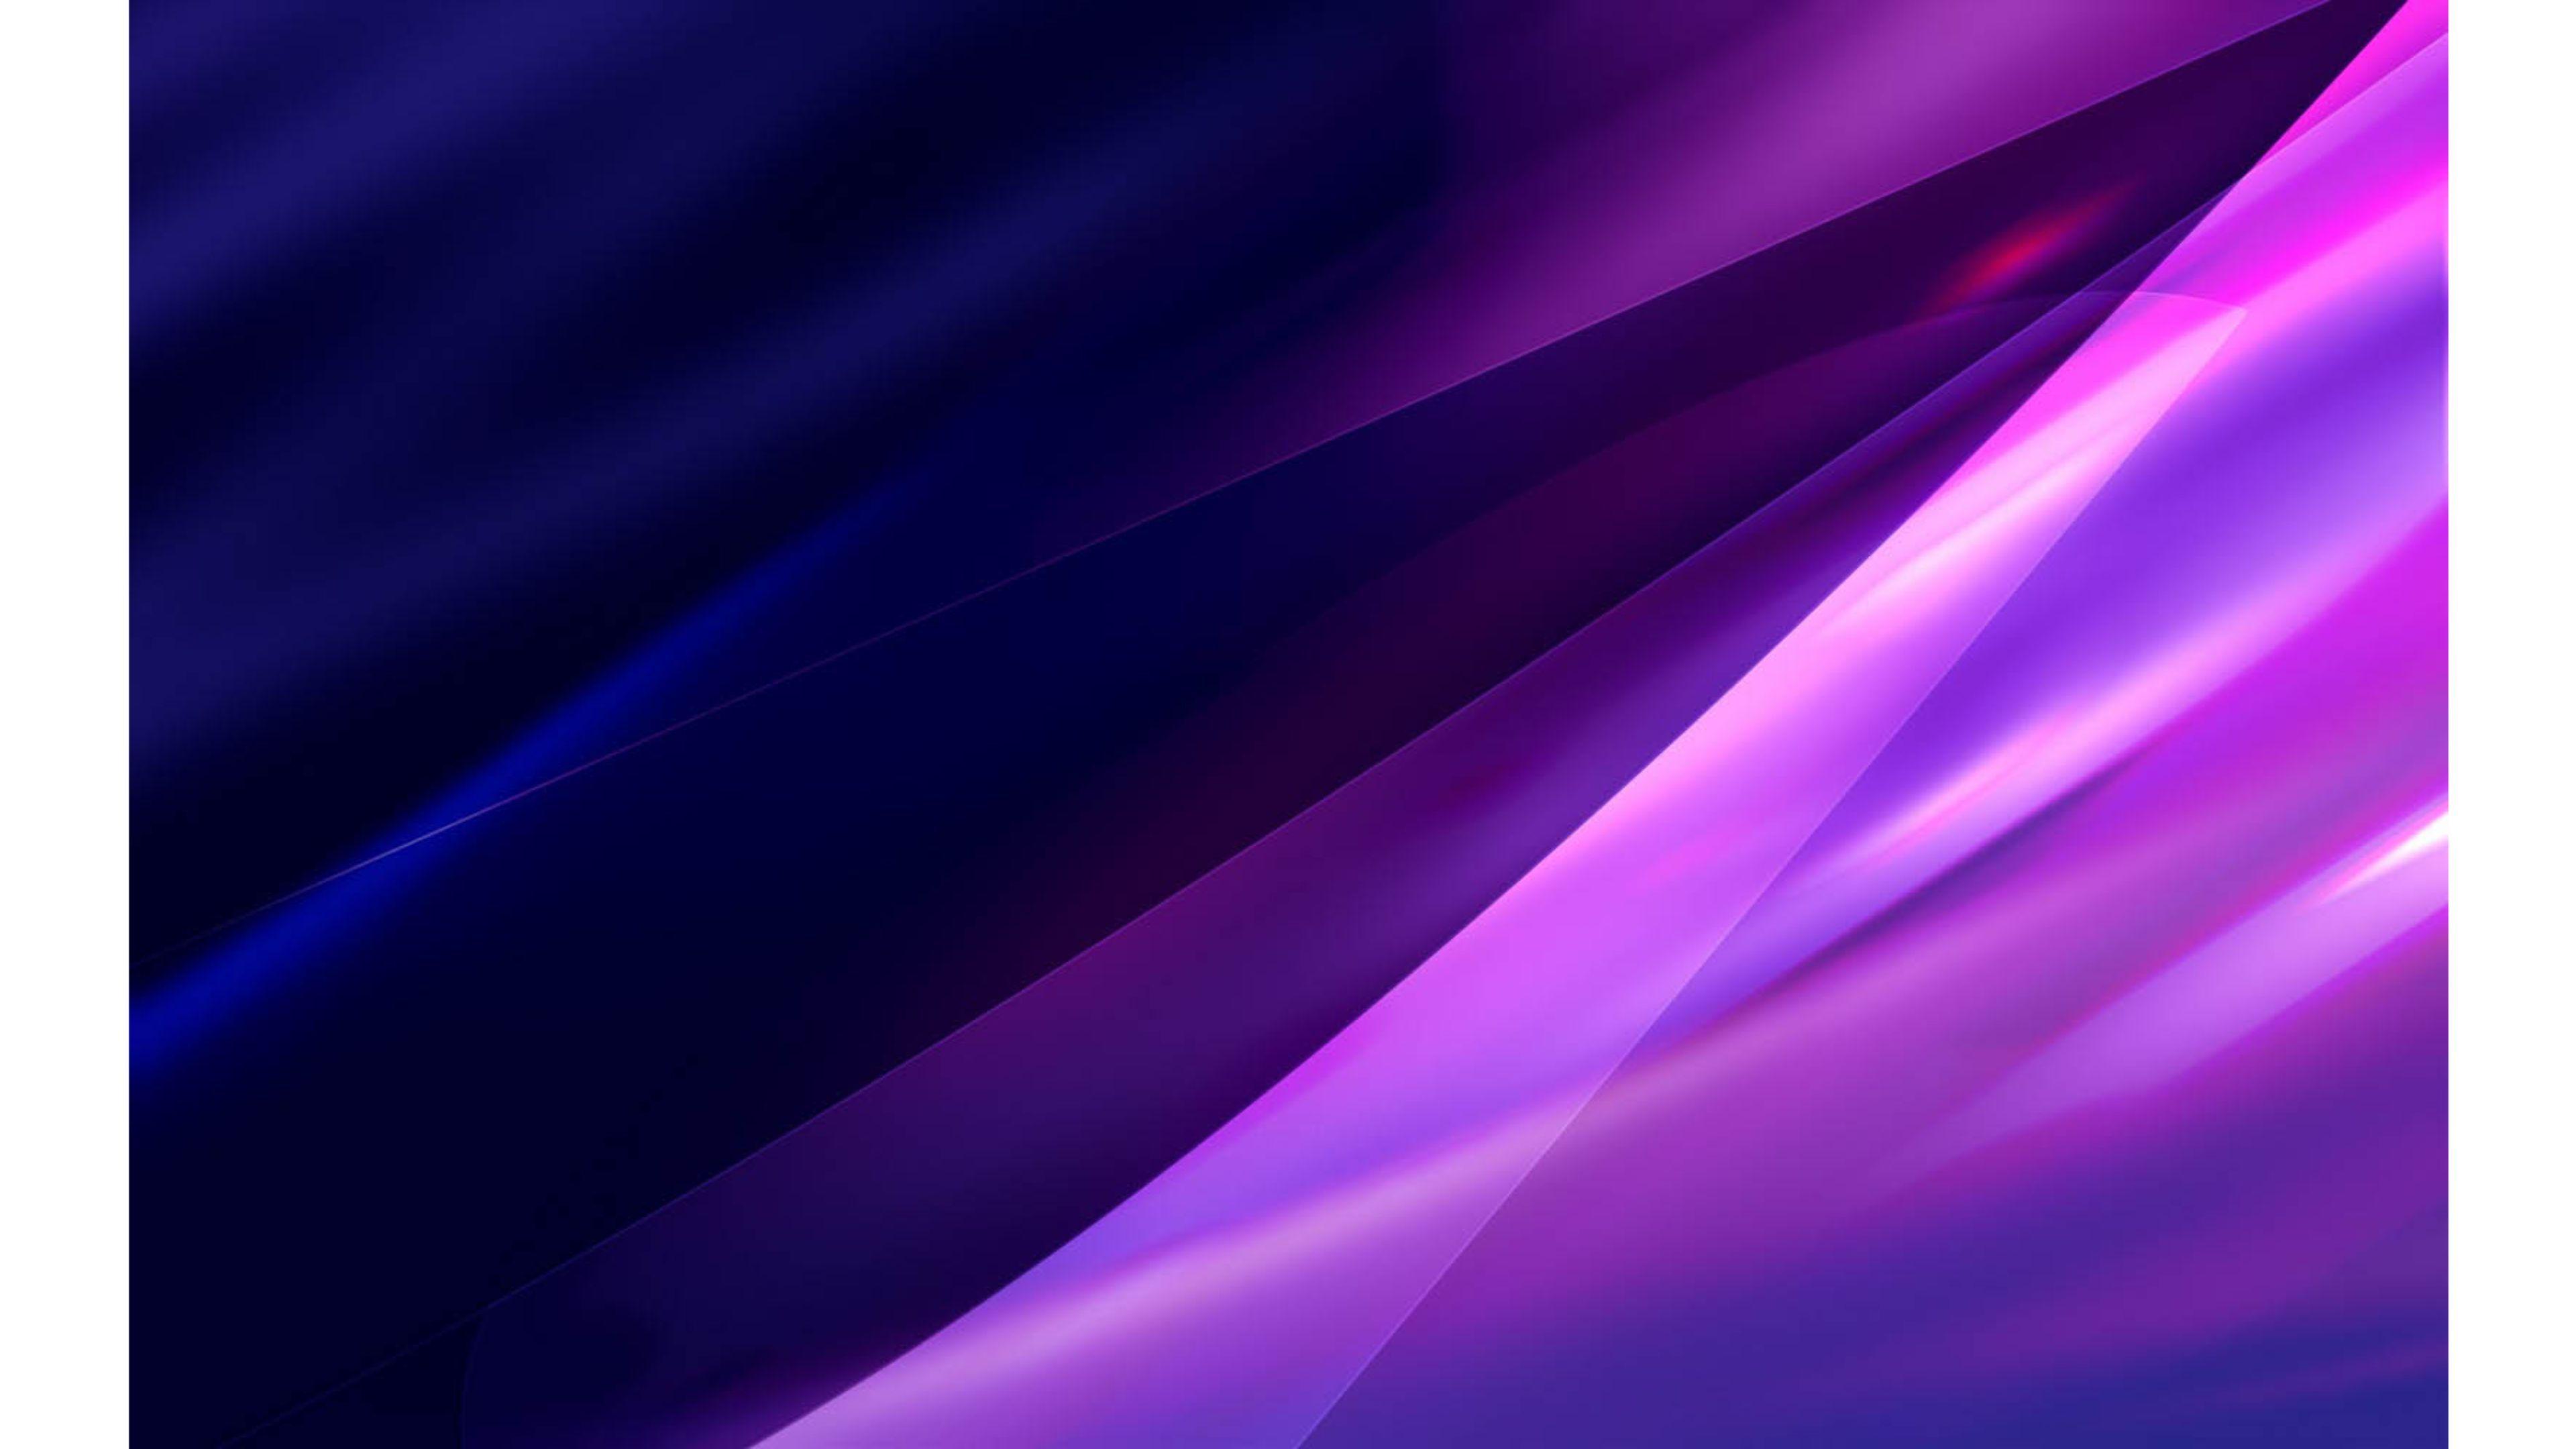 Purple Waves Abstract 4K Wallpaper Free 4K Wallpaper